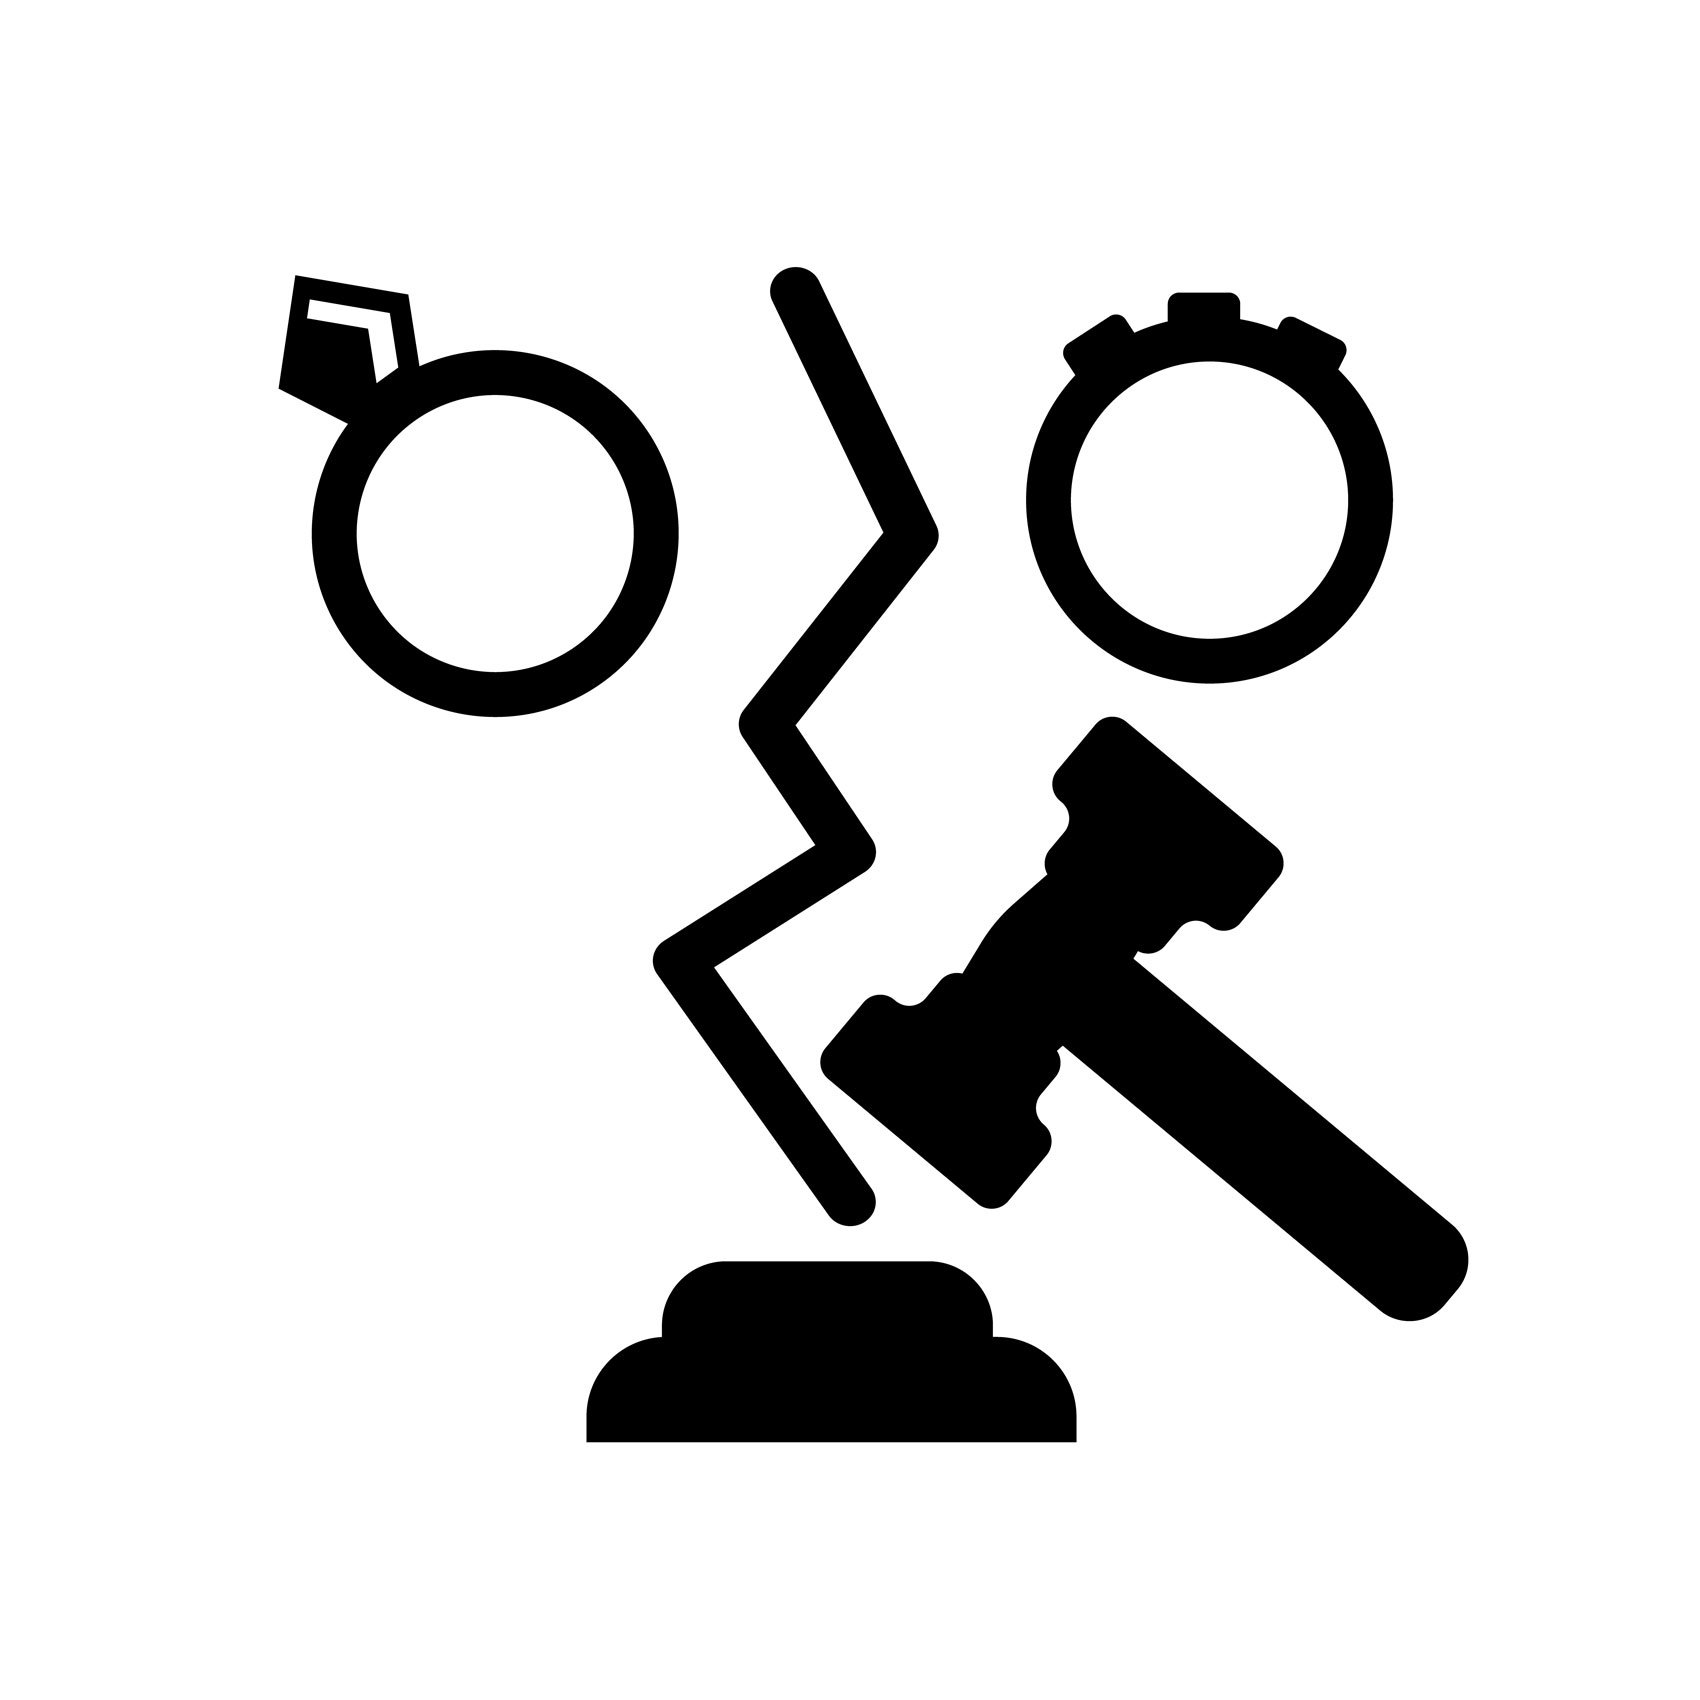 Divorce - idaho falls family law attorneys